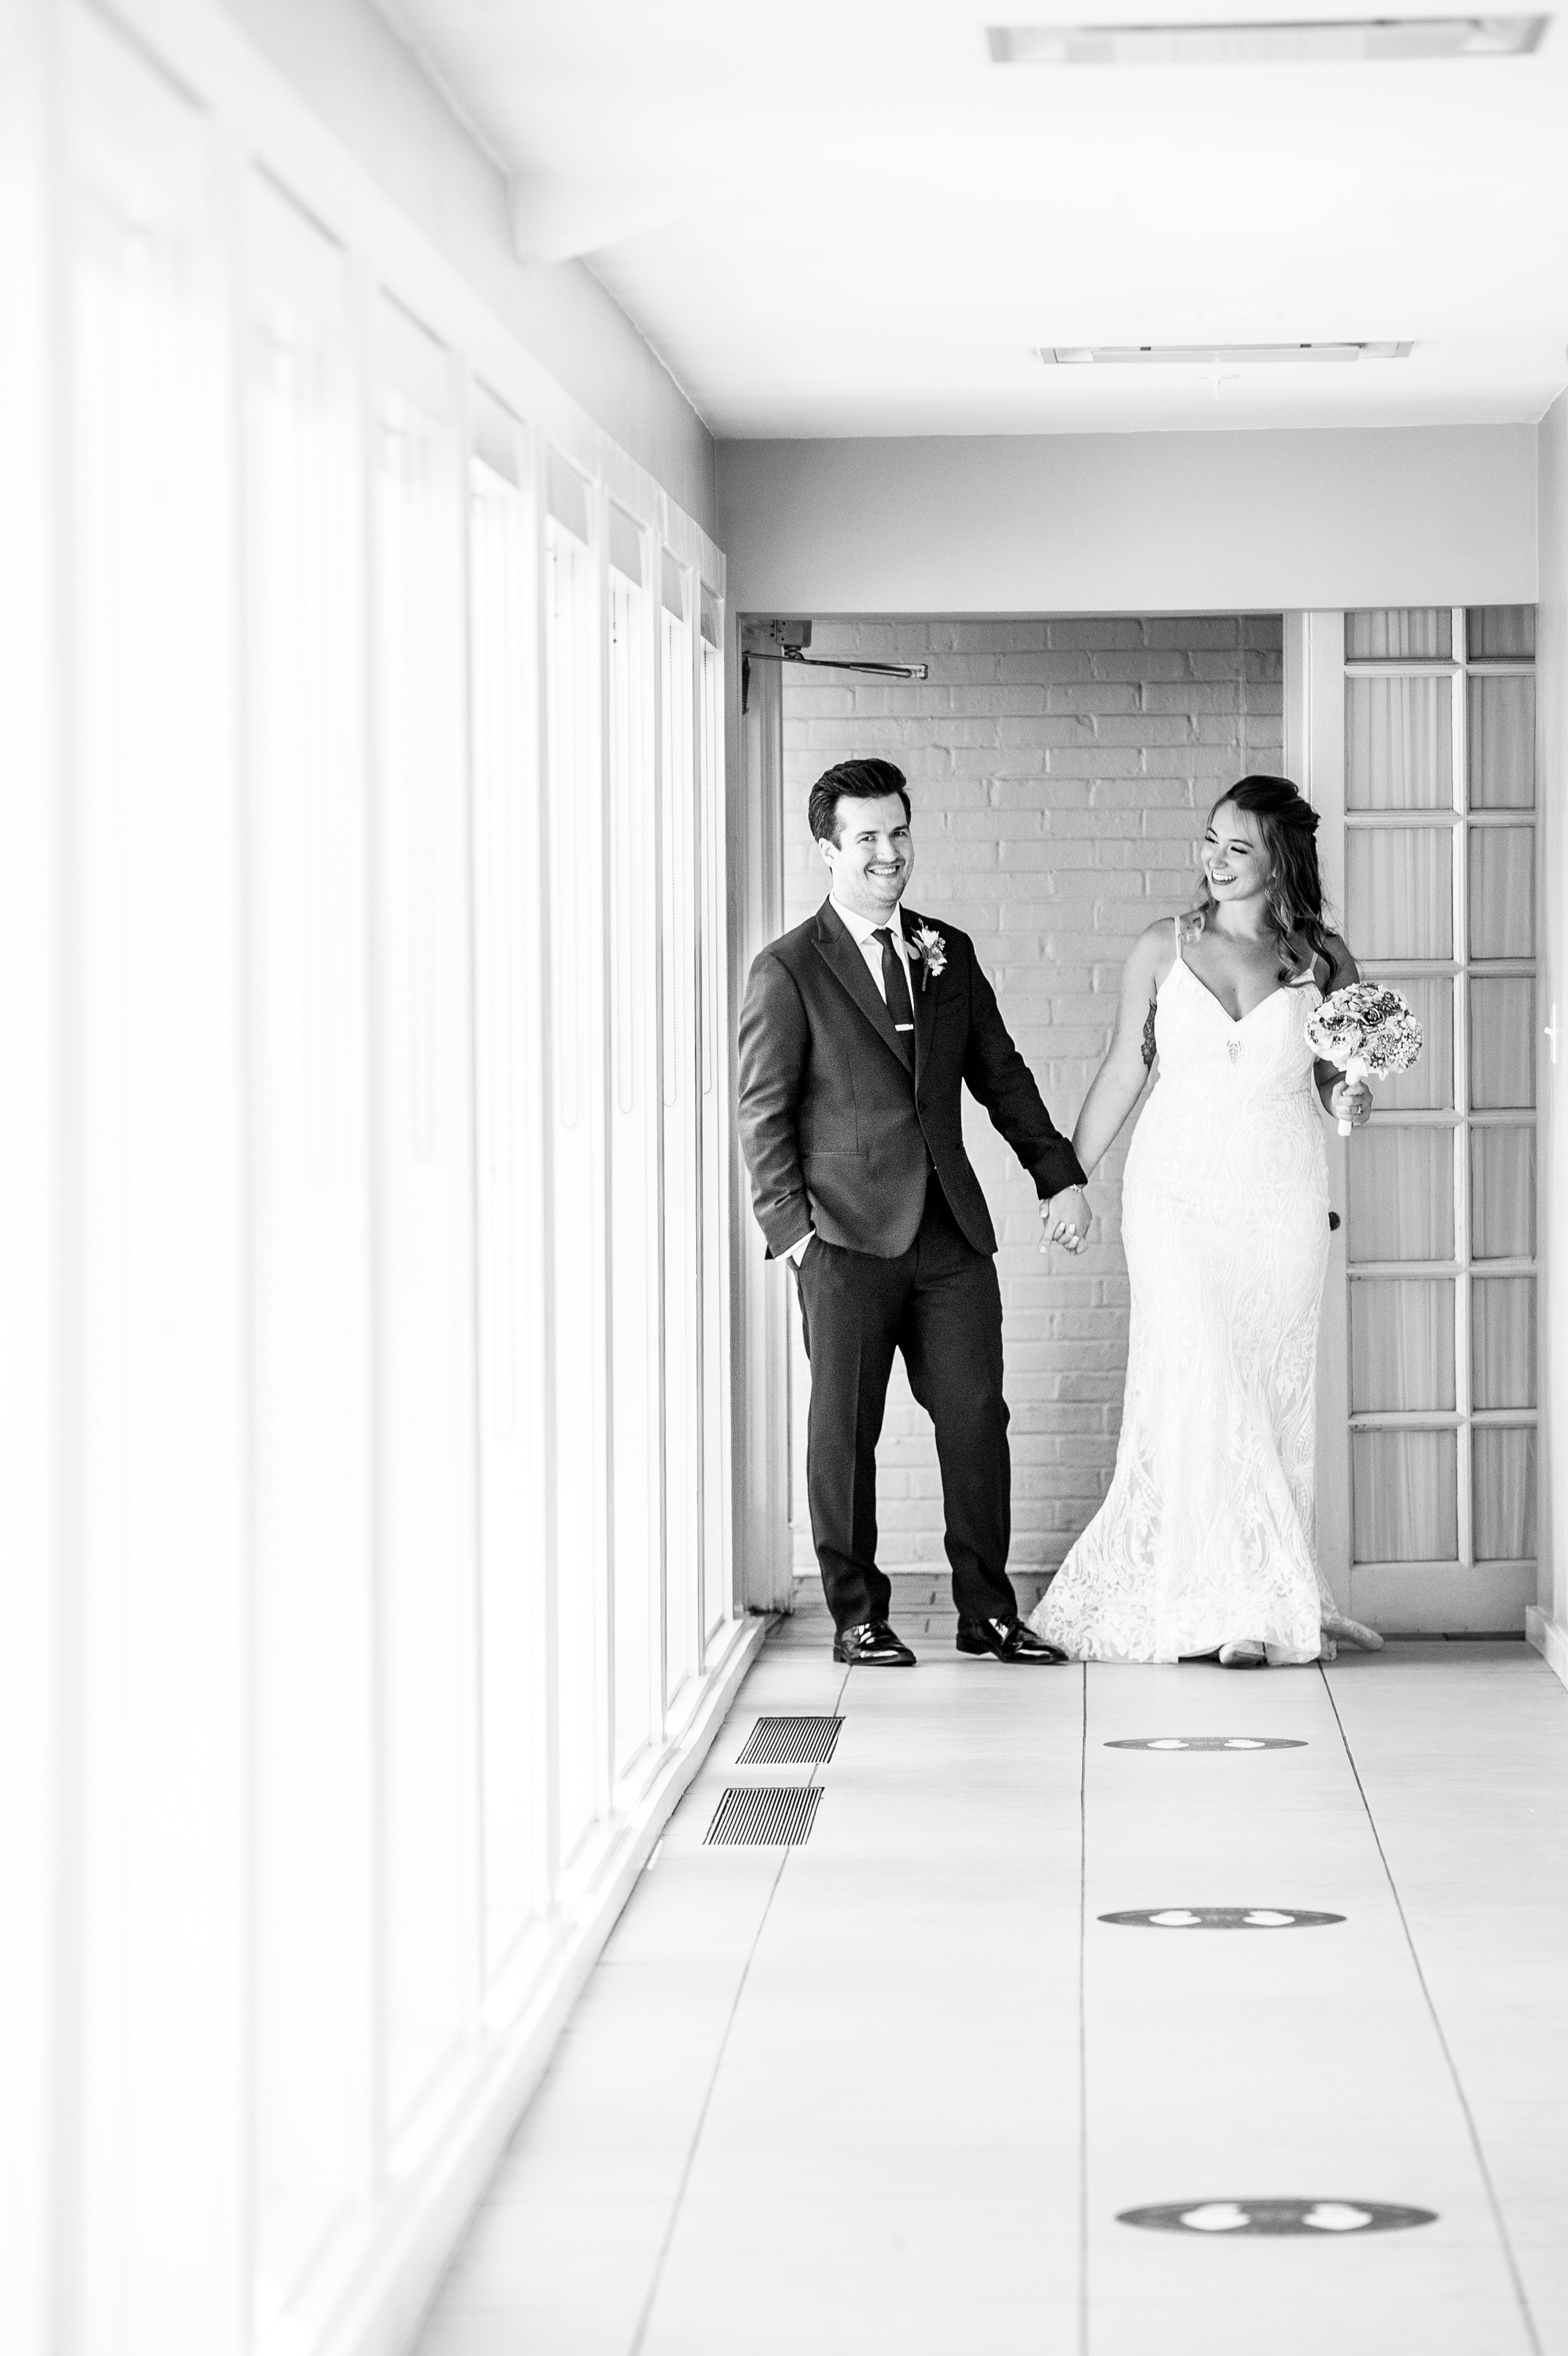 Chicago wedding photographer, intimate daytime wedding